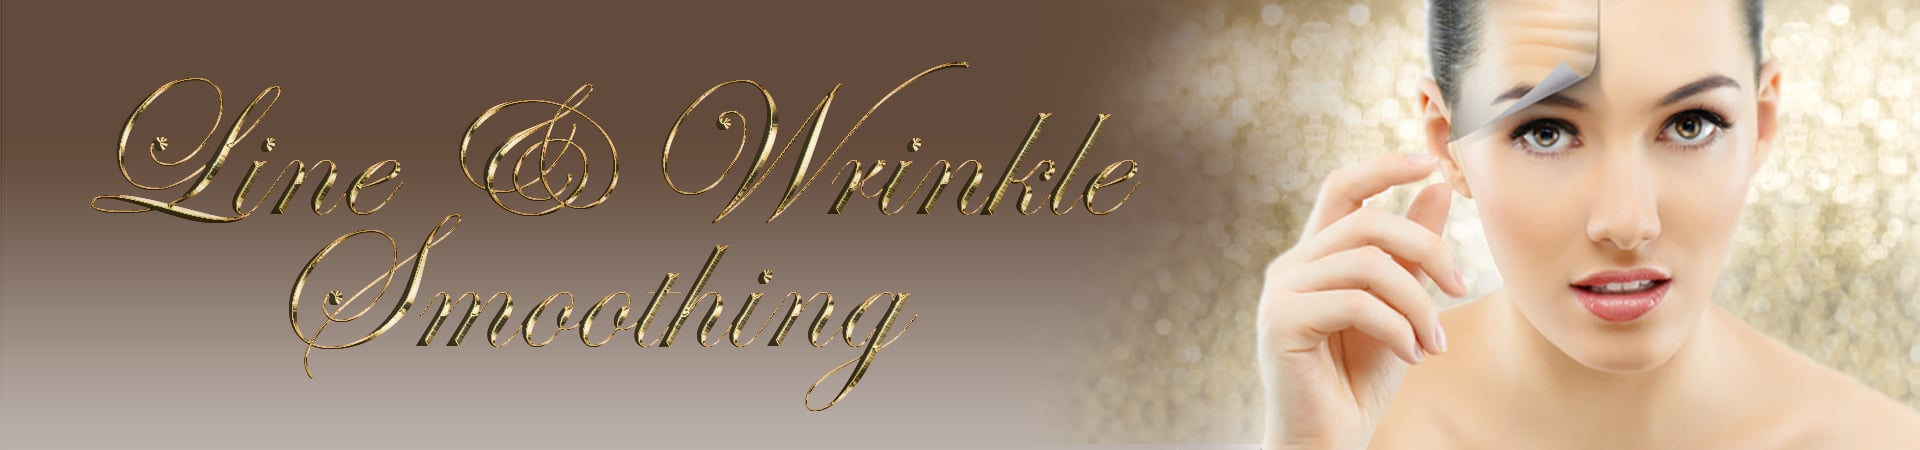 Line-wrinkle-smoothing